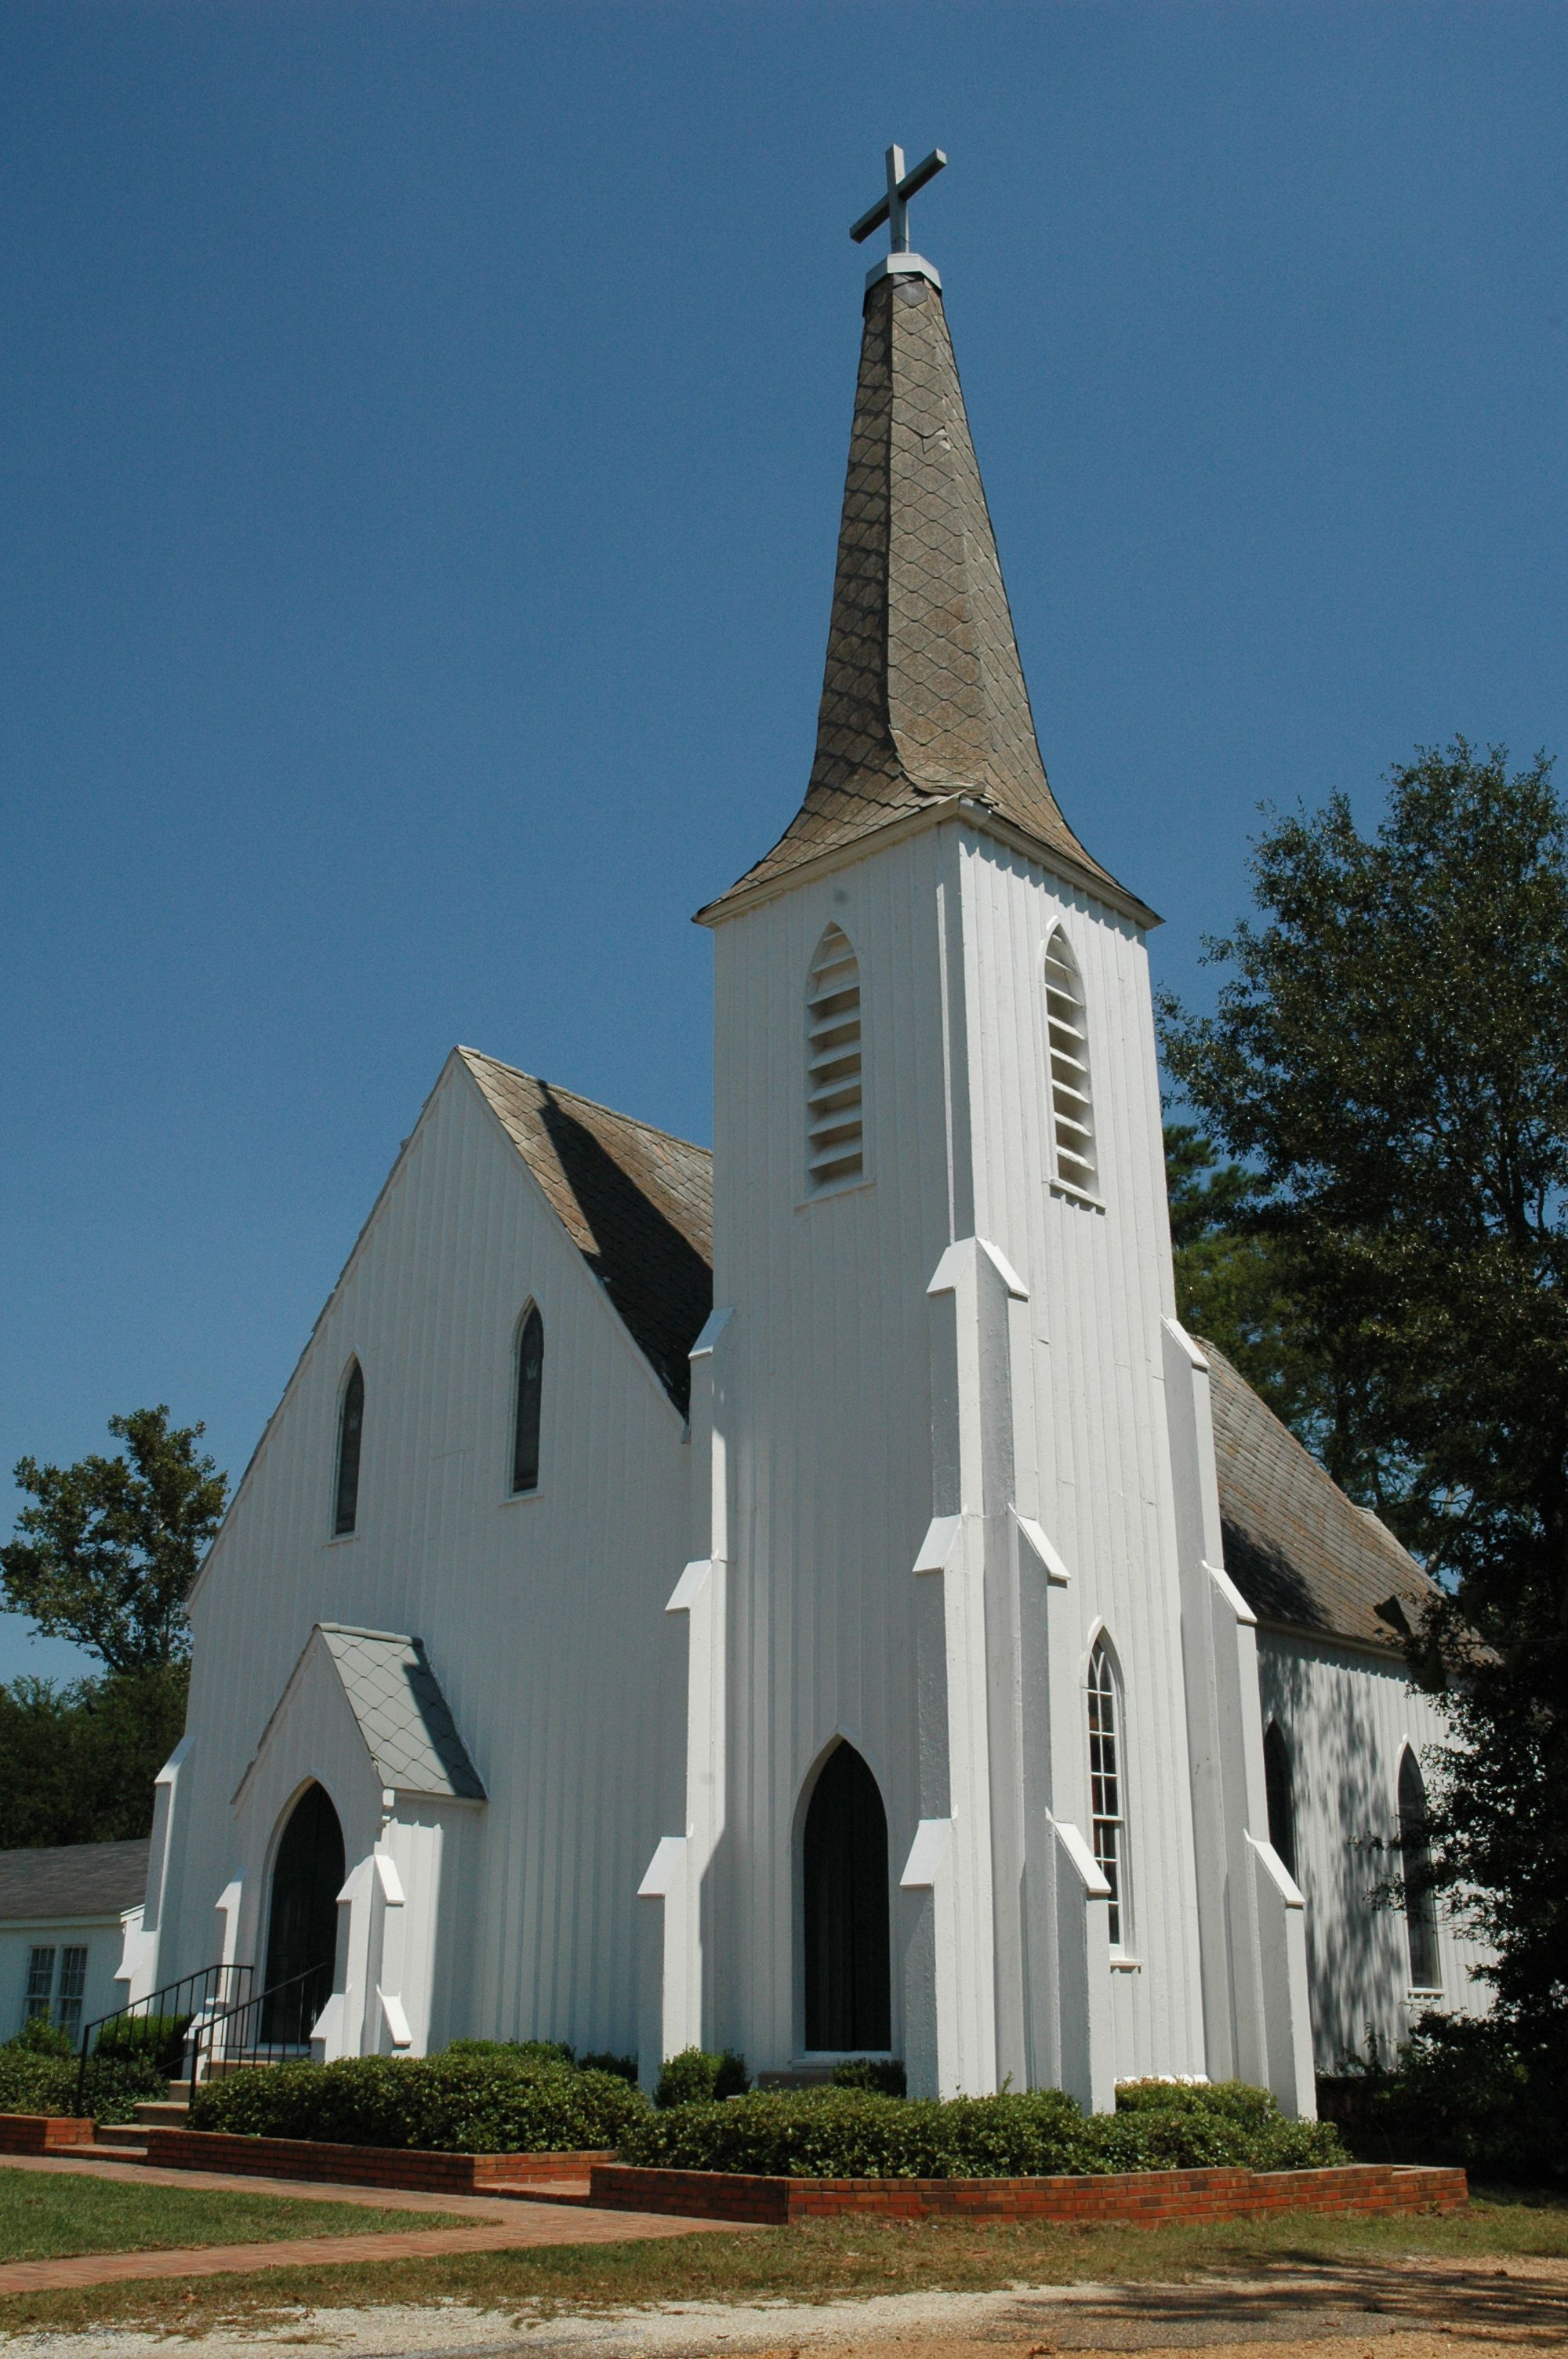 Lowndesboro church